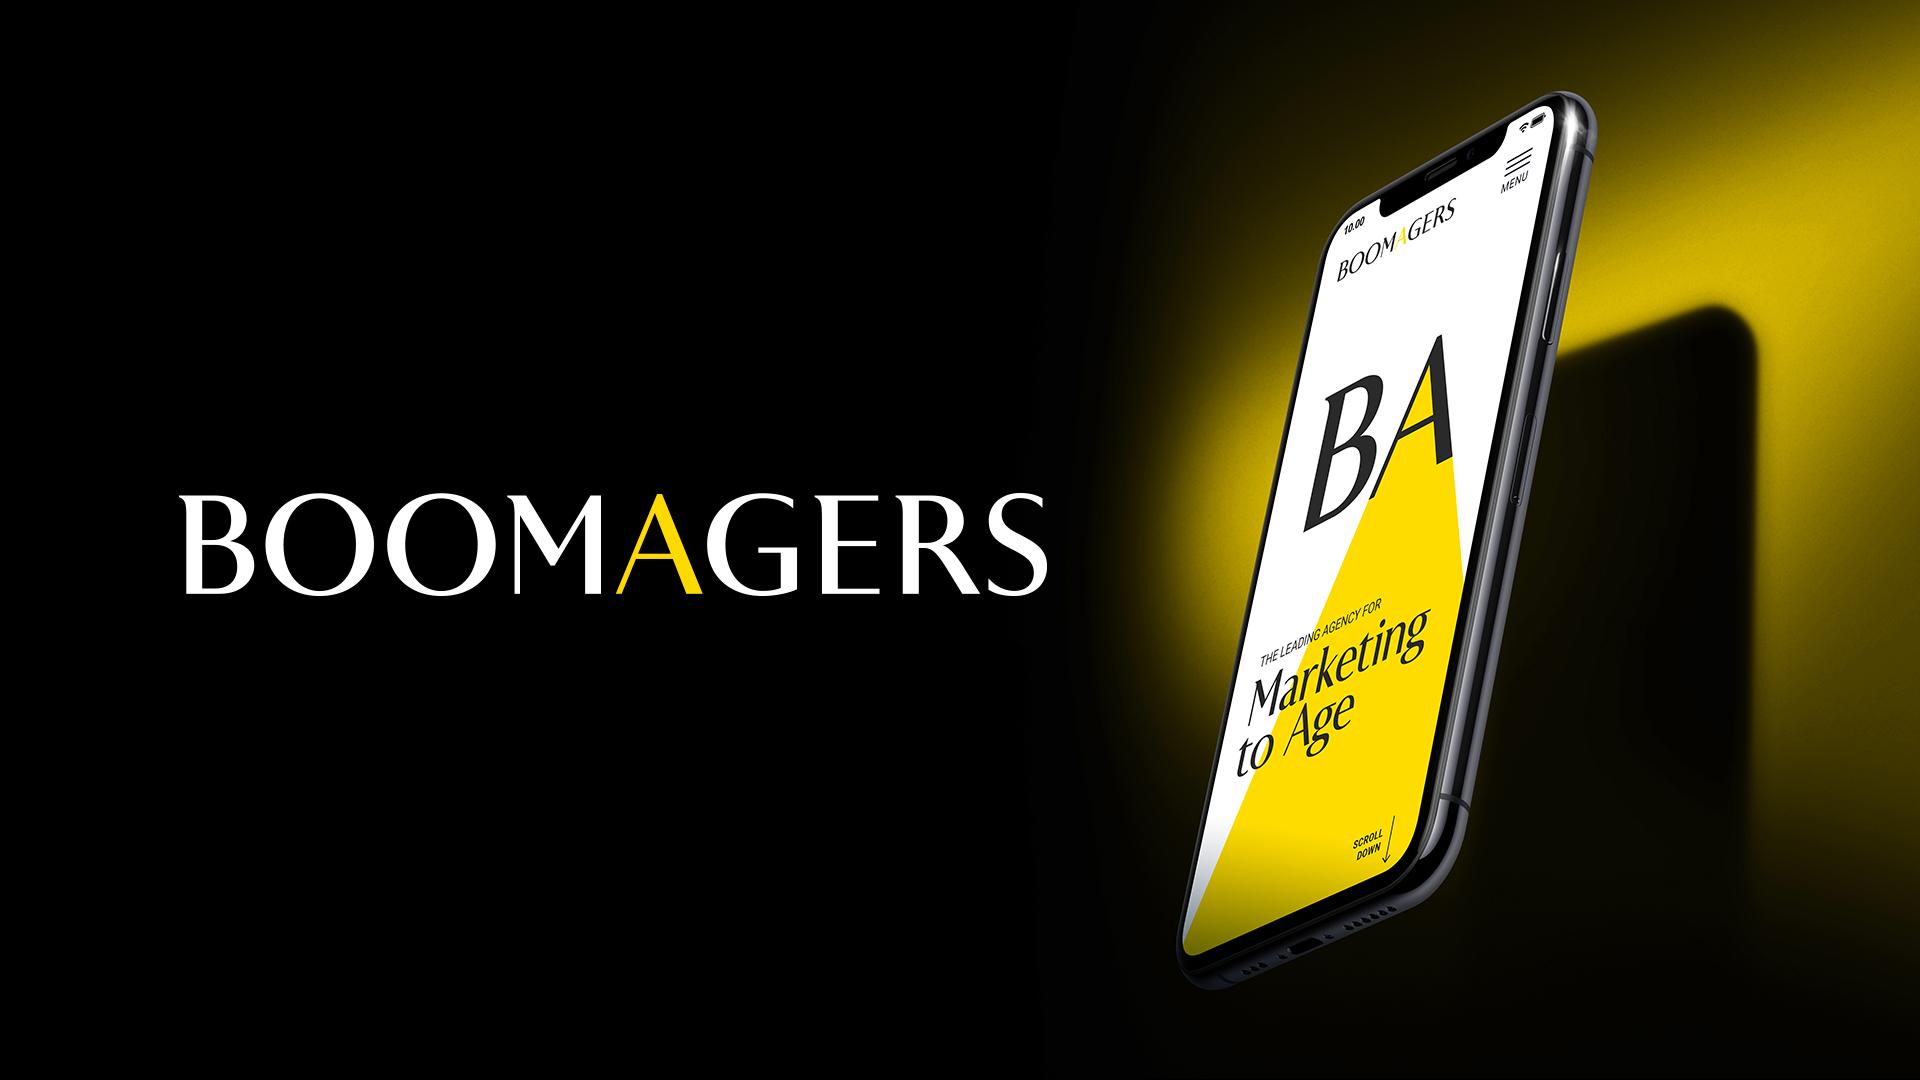 BoomAgers Branding